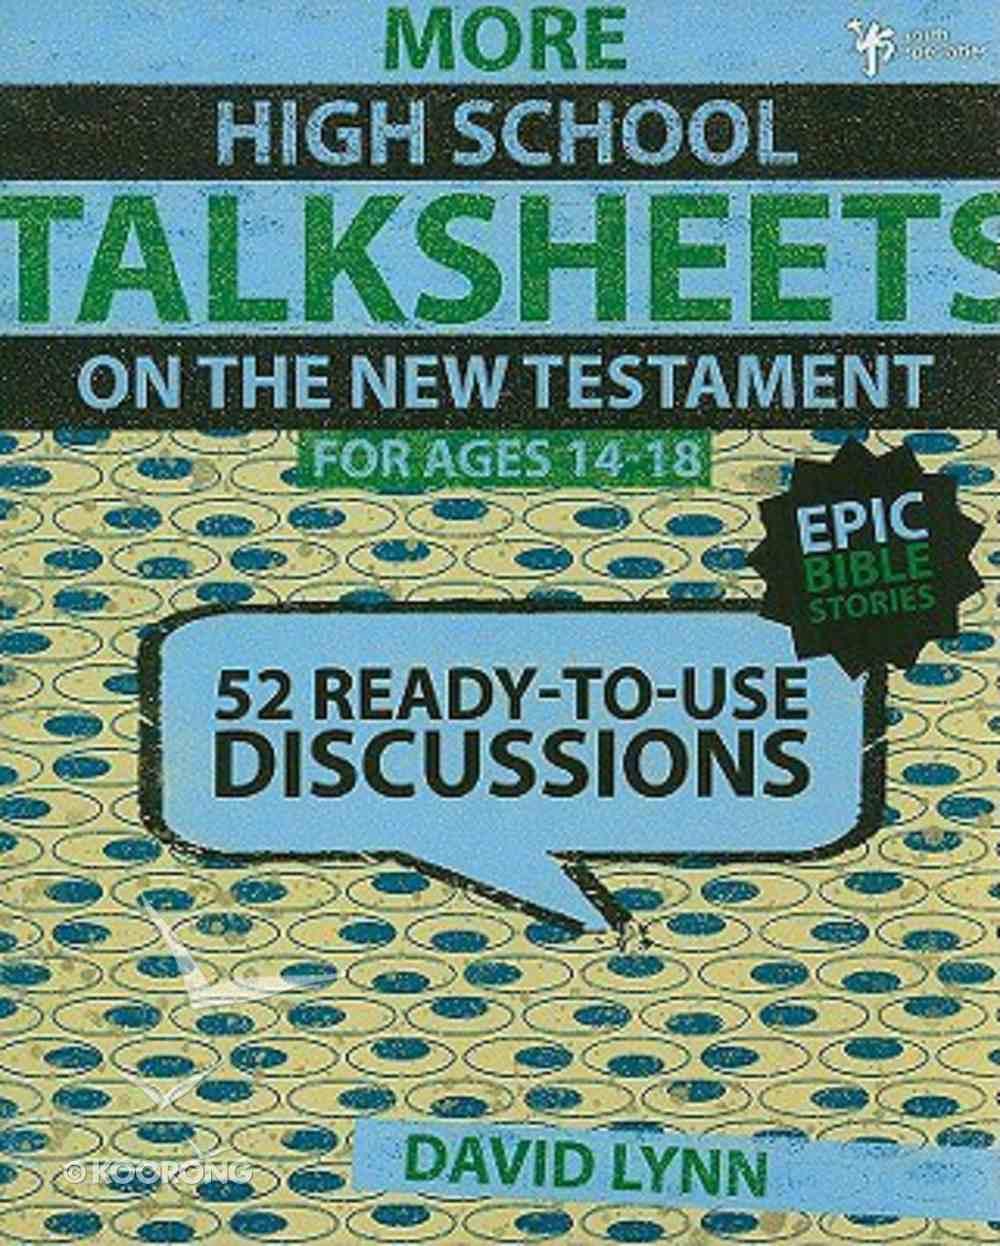 Still More High School New Testament (Ages 14-18) (Talksheets Series) Paperback